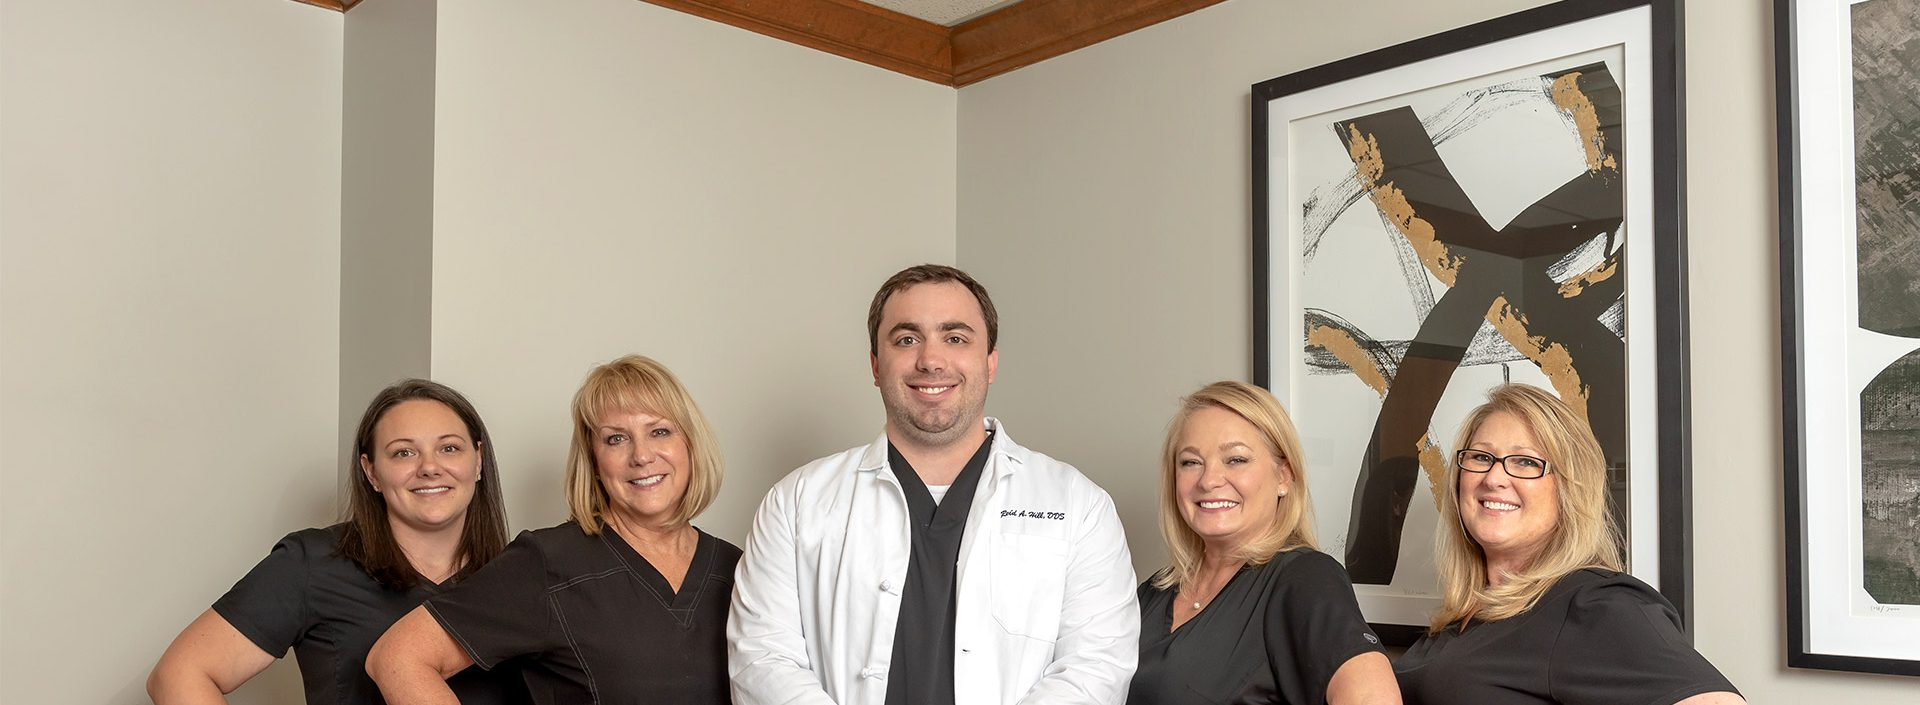 Hillsboro Village Dental Team